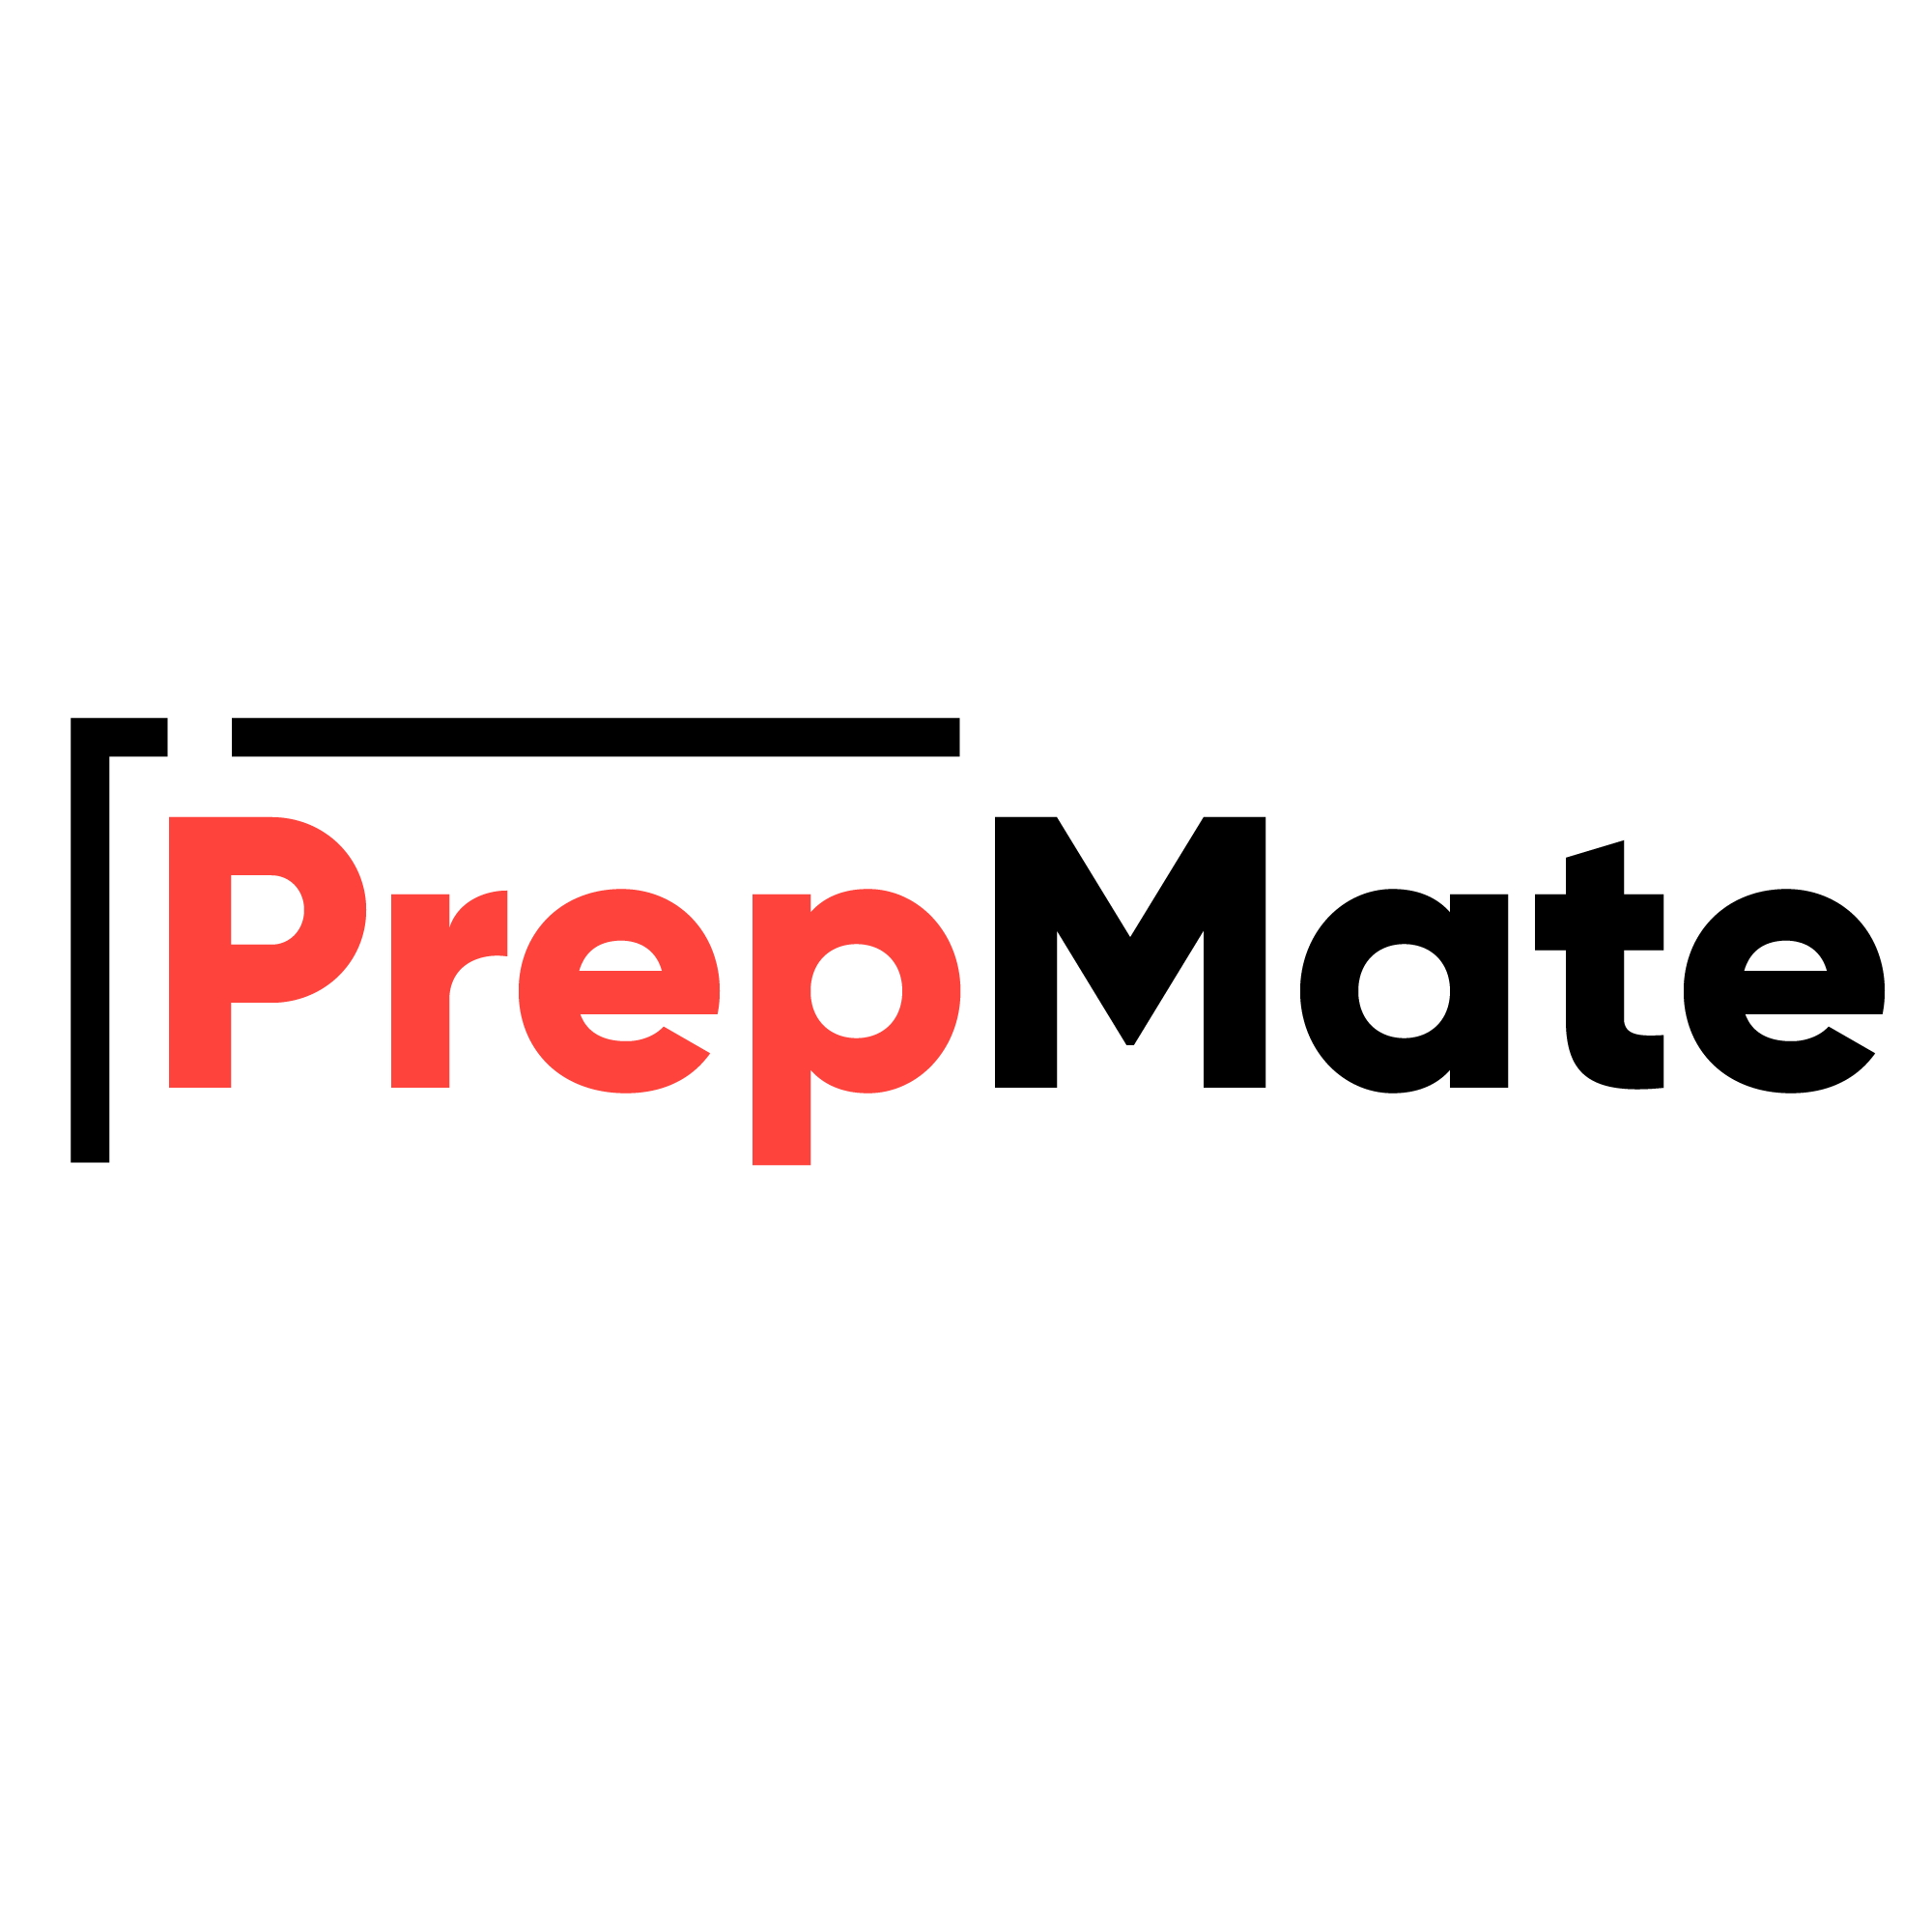 Copy of PrepMate Logo.png